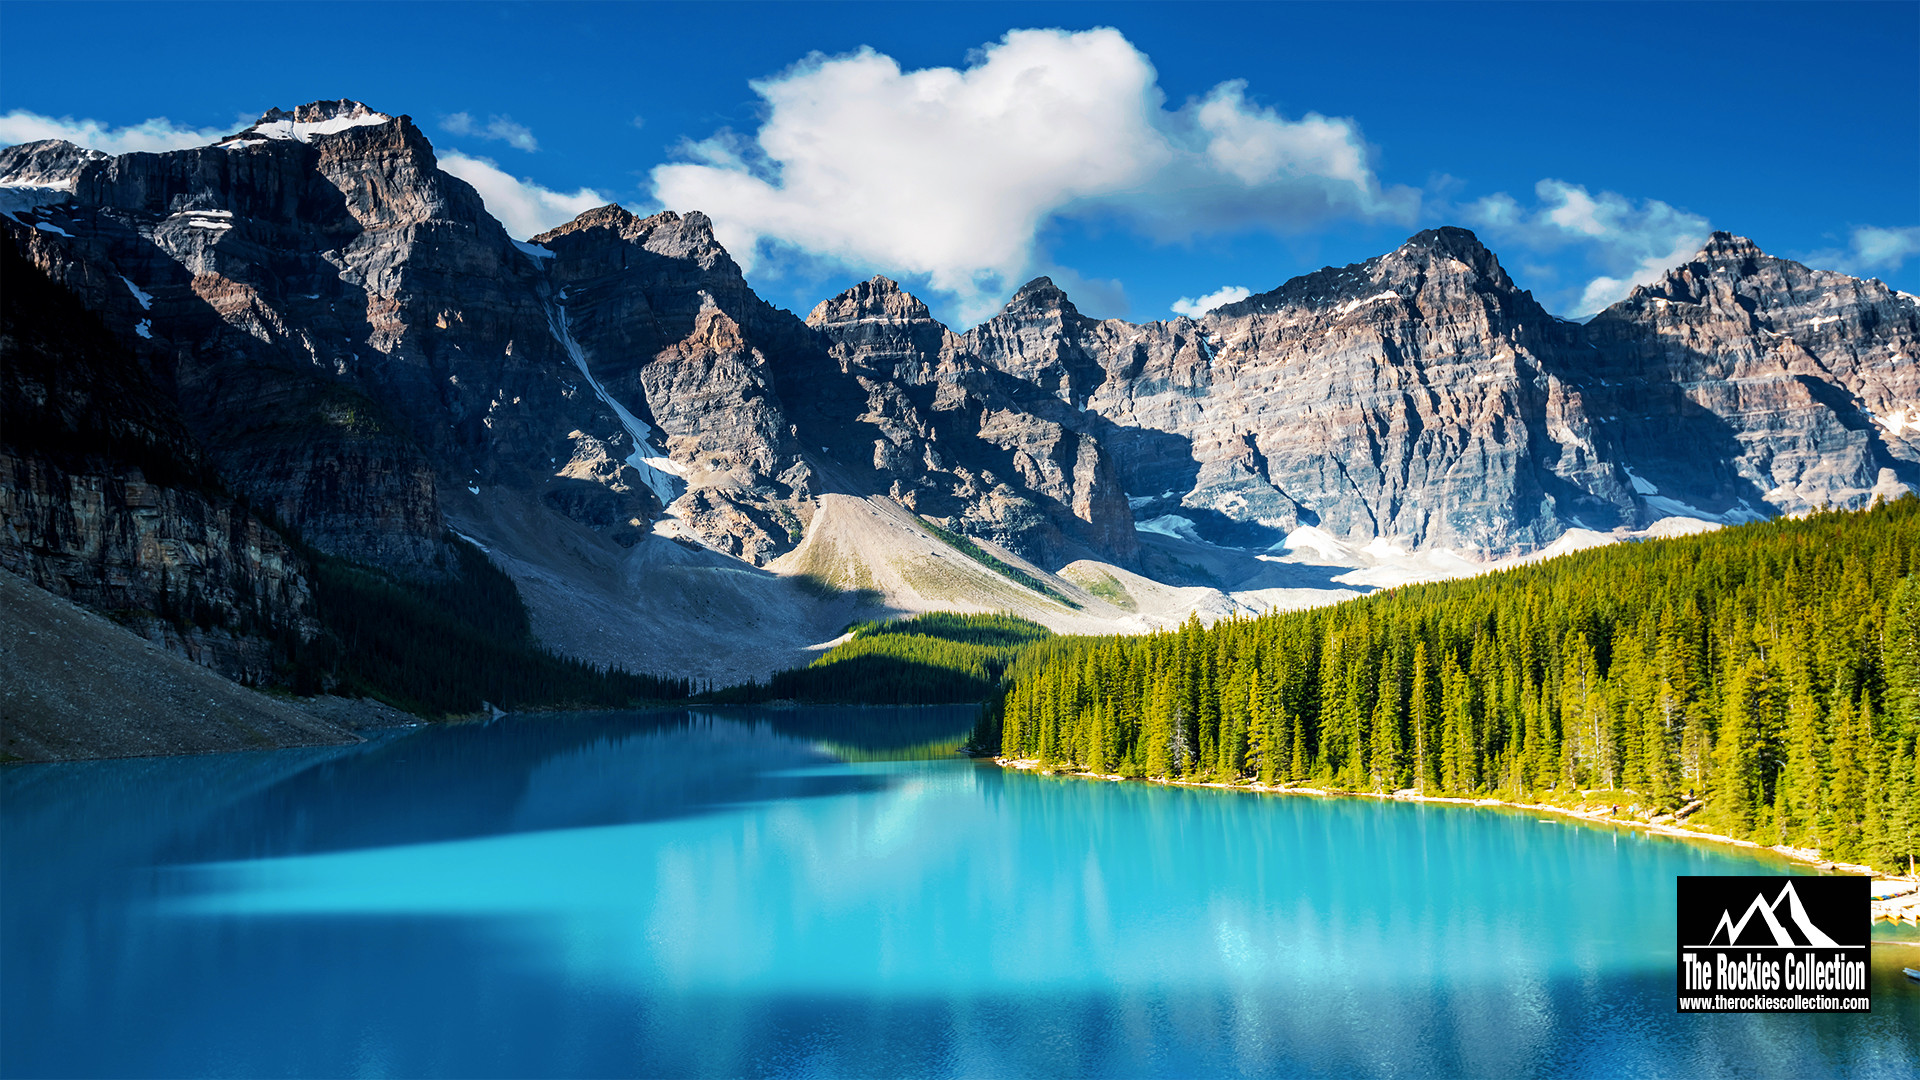 MORAINE LAKE - BANFF CANADIAN ROCKIES